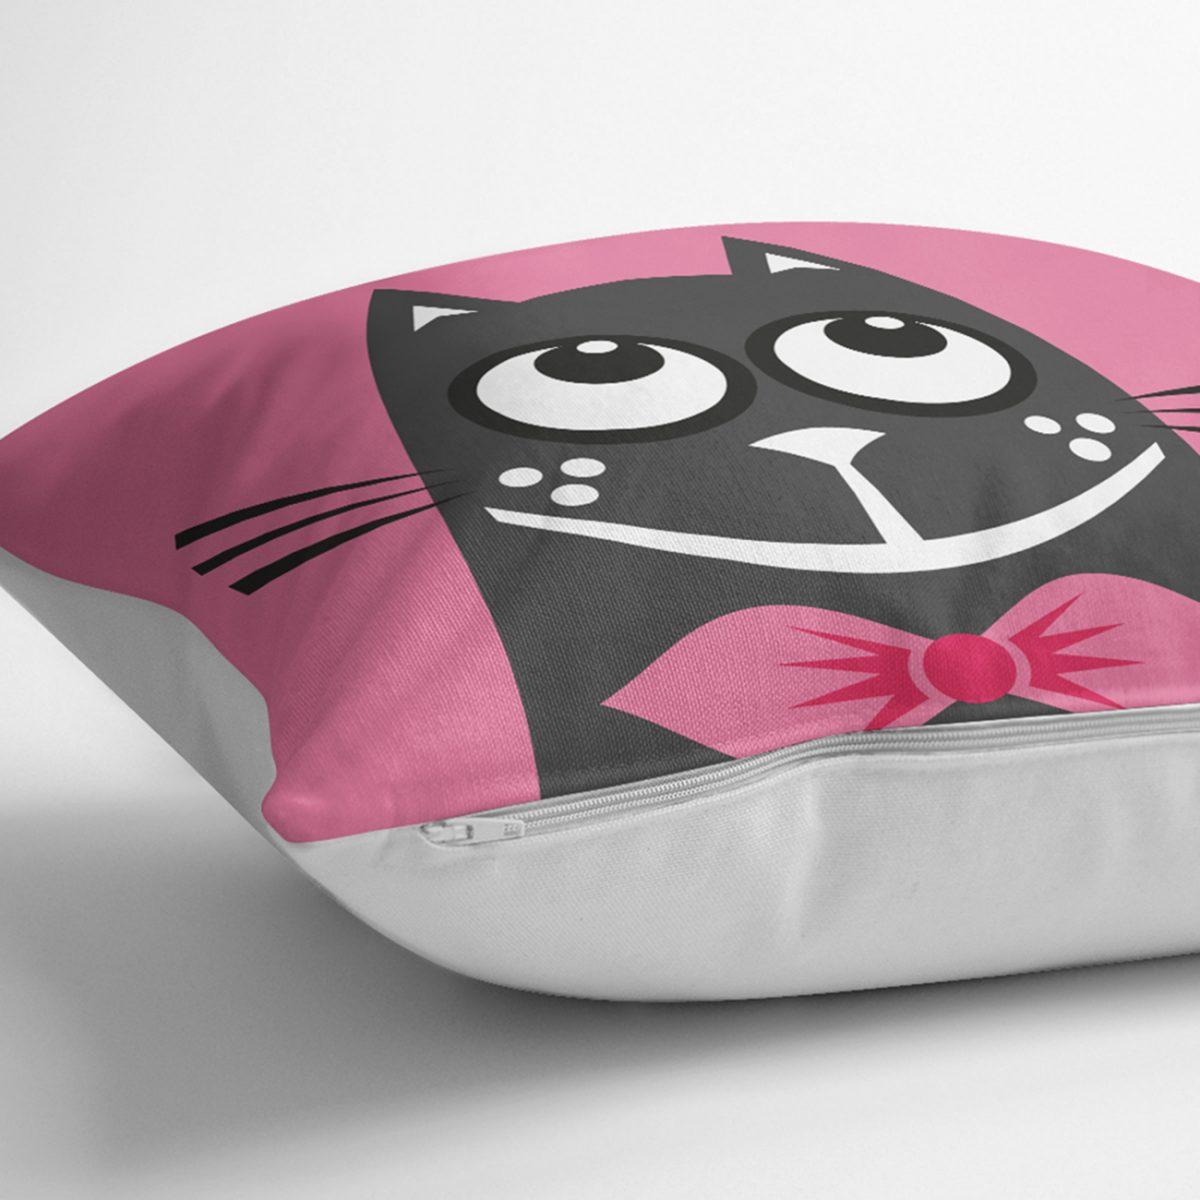 Çizgi Film Karakterli Pembe Zeminde Kedi Modern Kırlent Kılıfı Realhomes